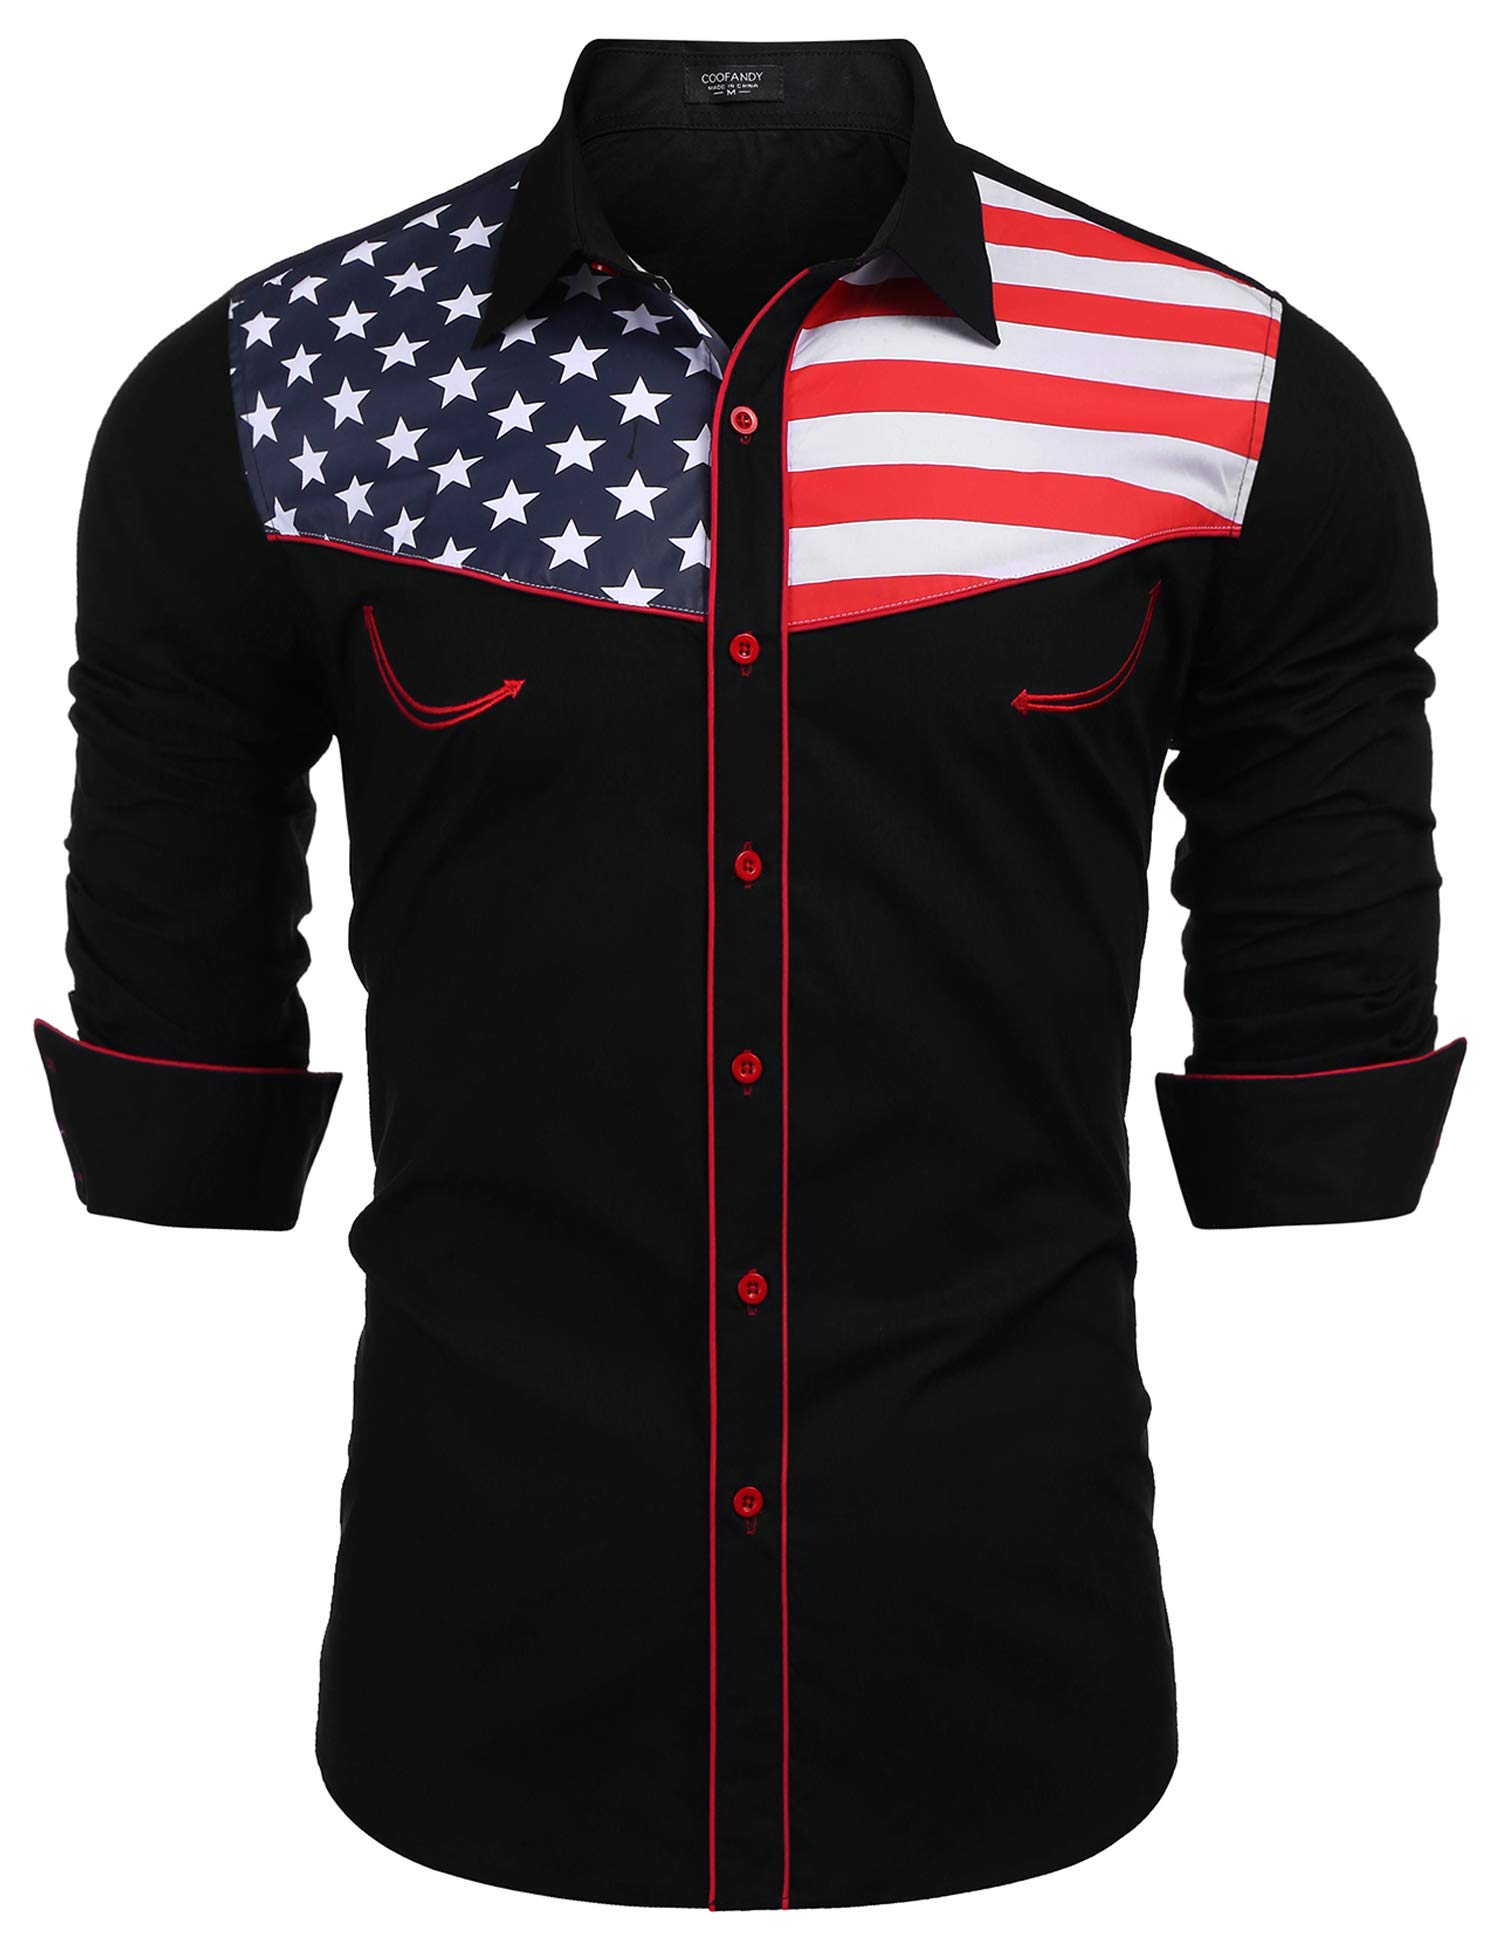 COOFANDY American Shirts Western X Large